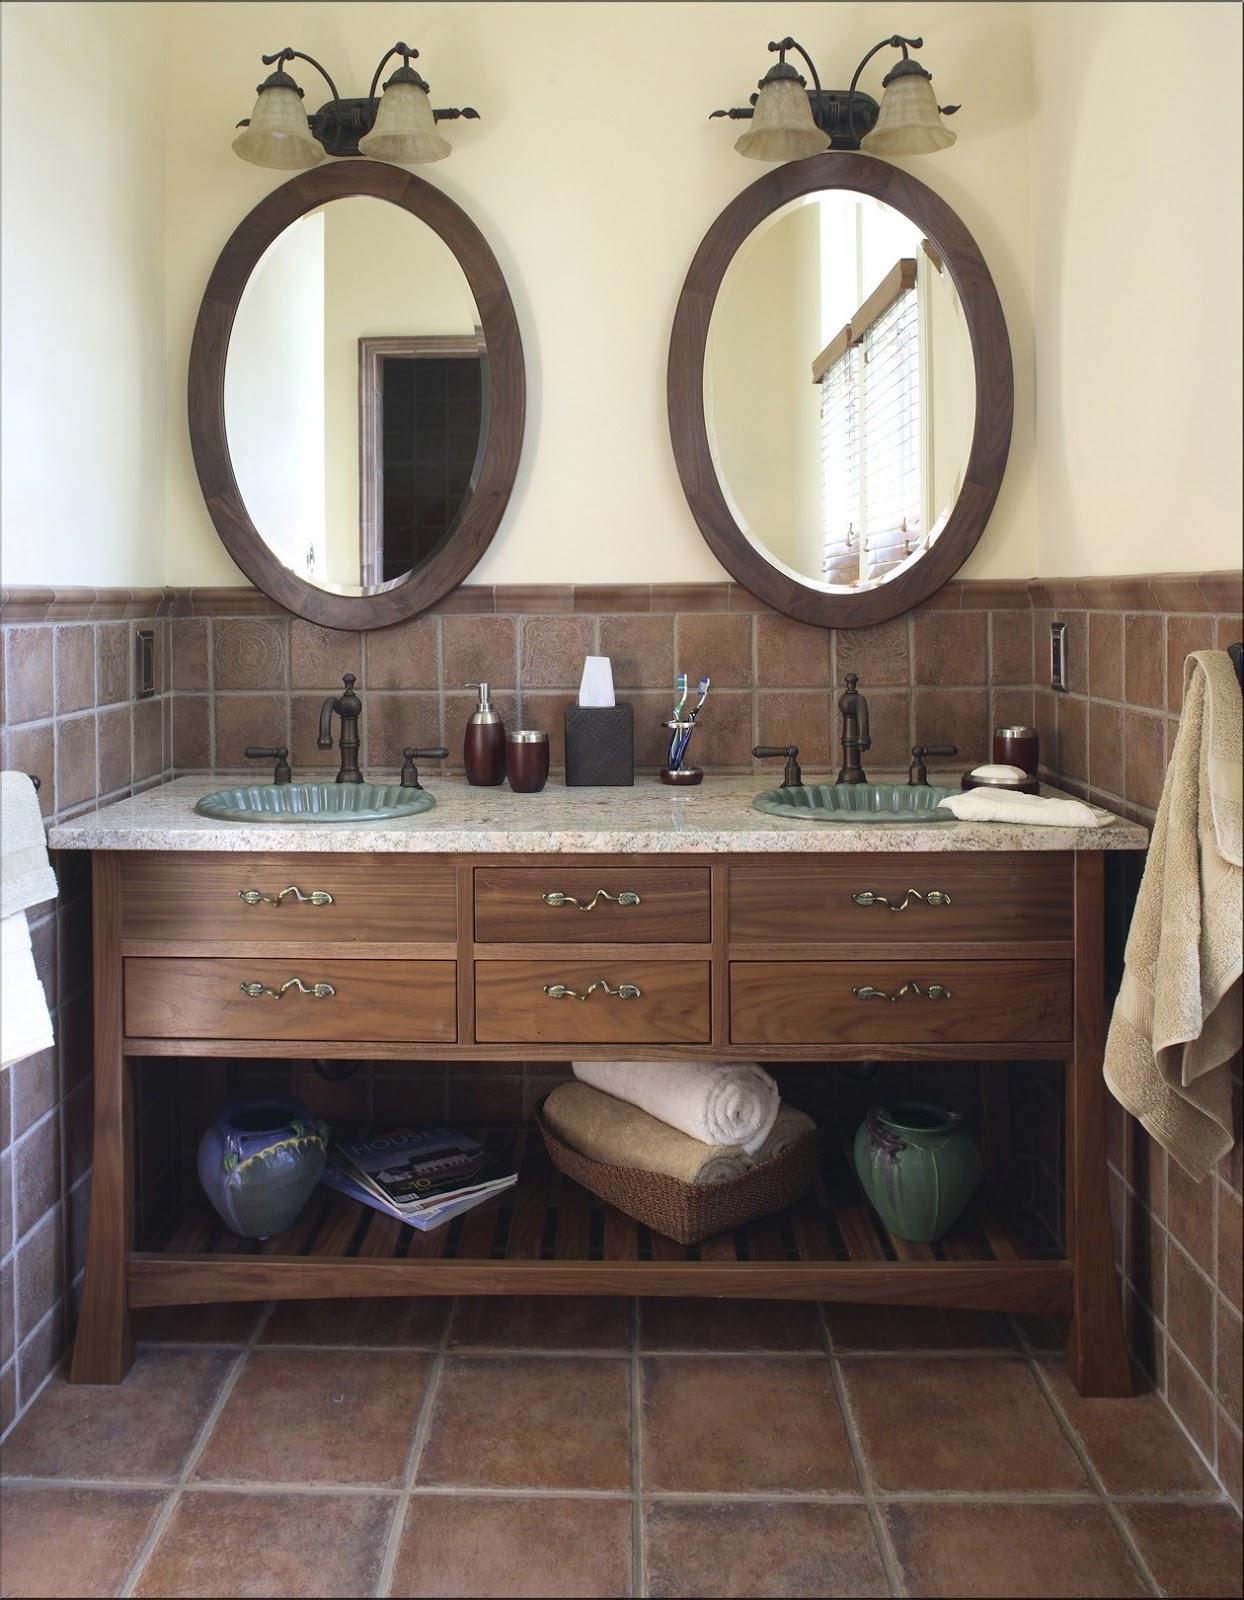 Elegant%2BVanity%2BMirrors%2Bwith%2BSink%2BDesign%2Bfor%2Bbathroom%2Bprepare%2B%252822%2529 25 Elegant Vanity Mirrors with Sink Design for Bathroom Prepare Interior